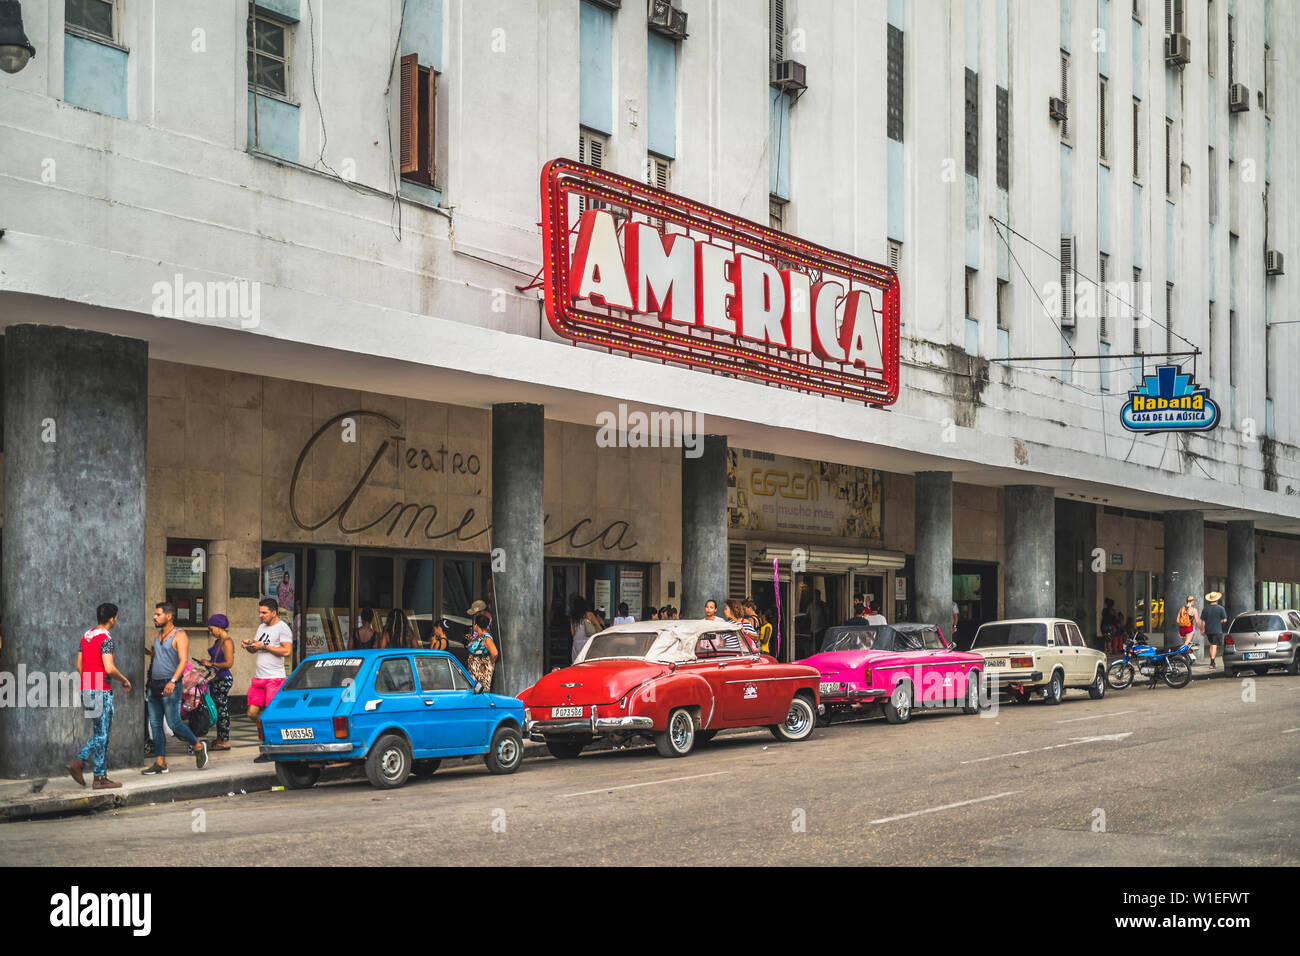 Old vintage cars parked outside Teatro America, La Habana (Havana), Cuba, West Indies, Caribbean, Central America - Stock Image